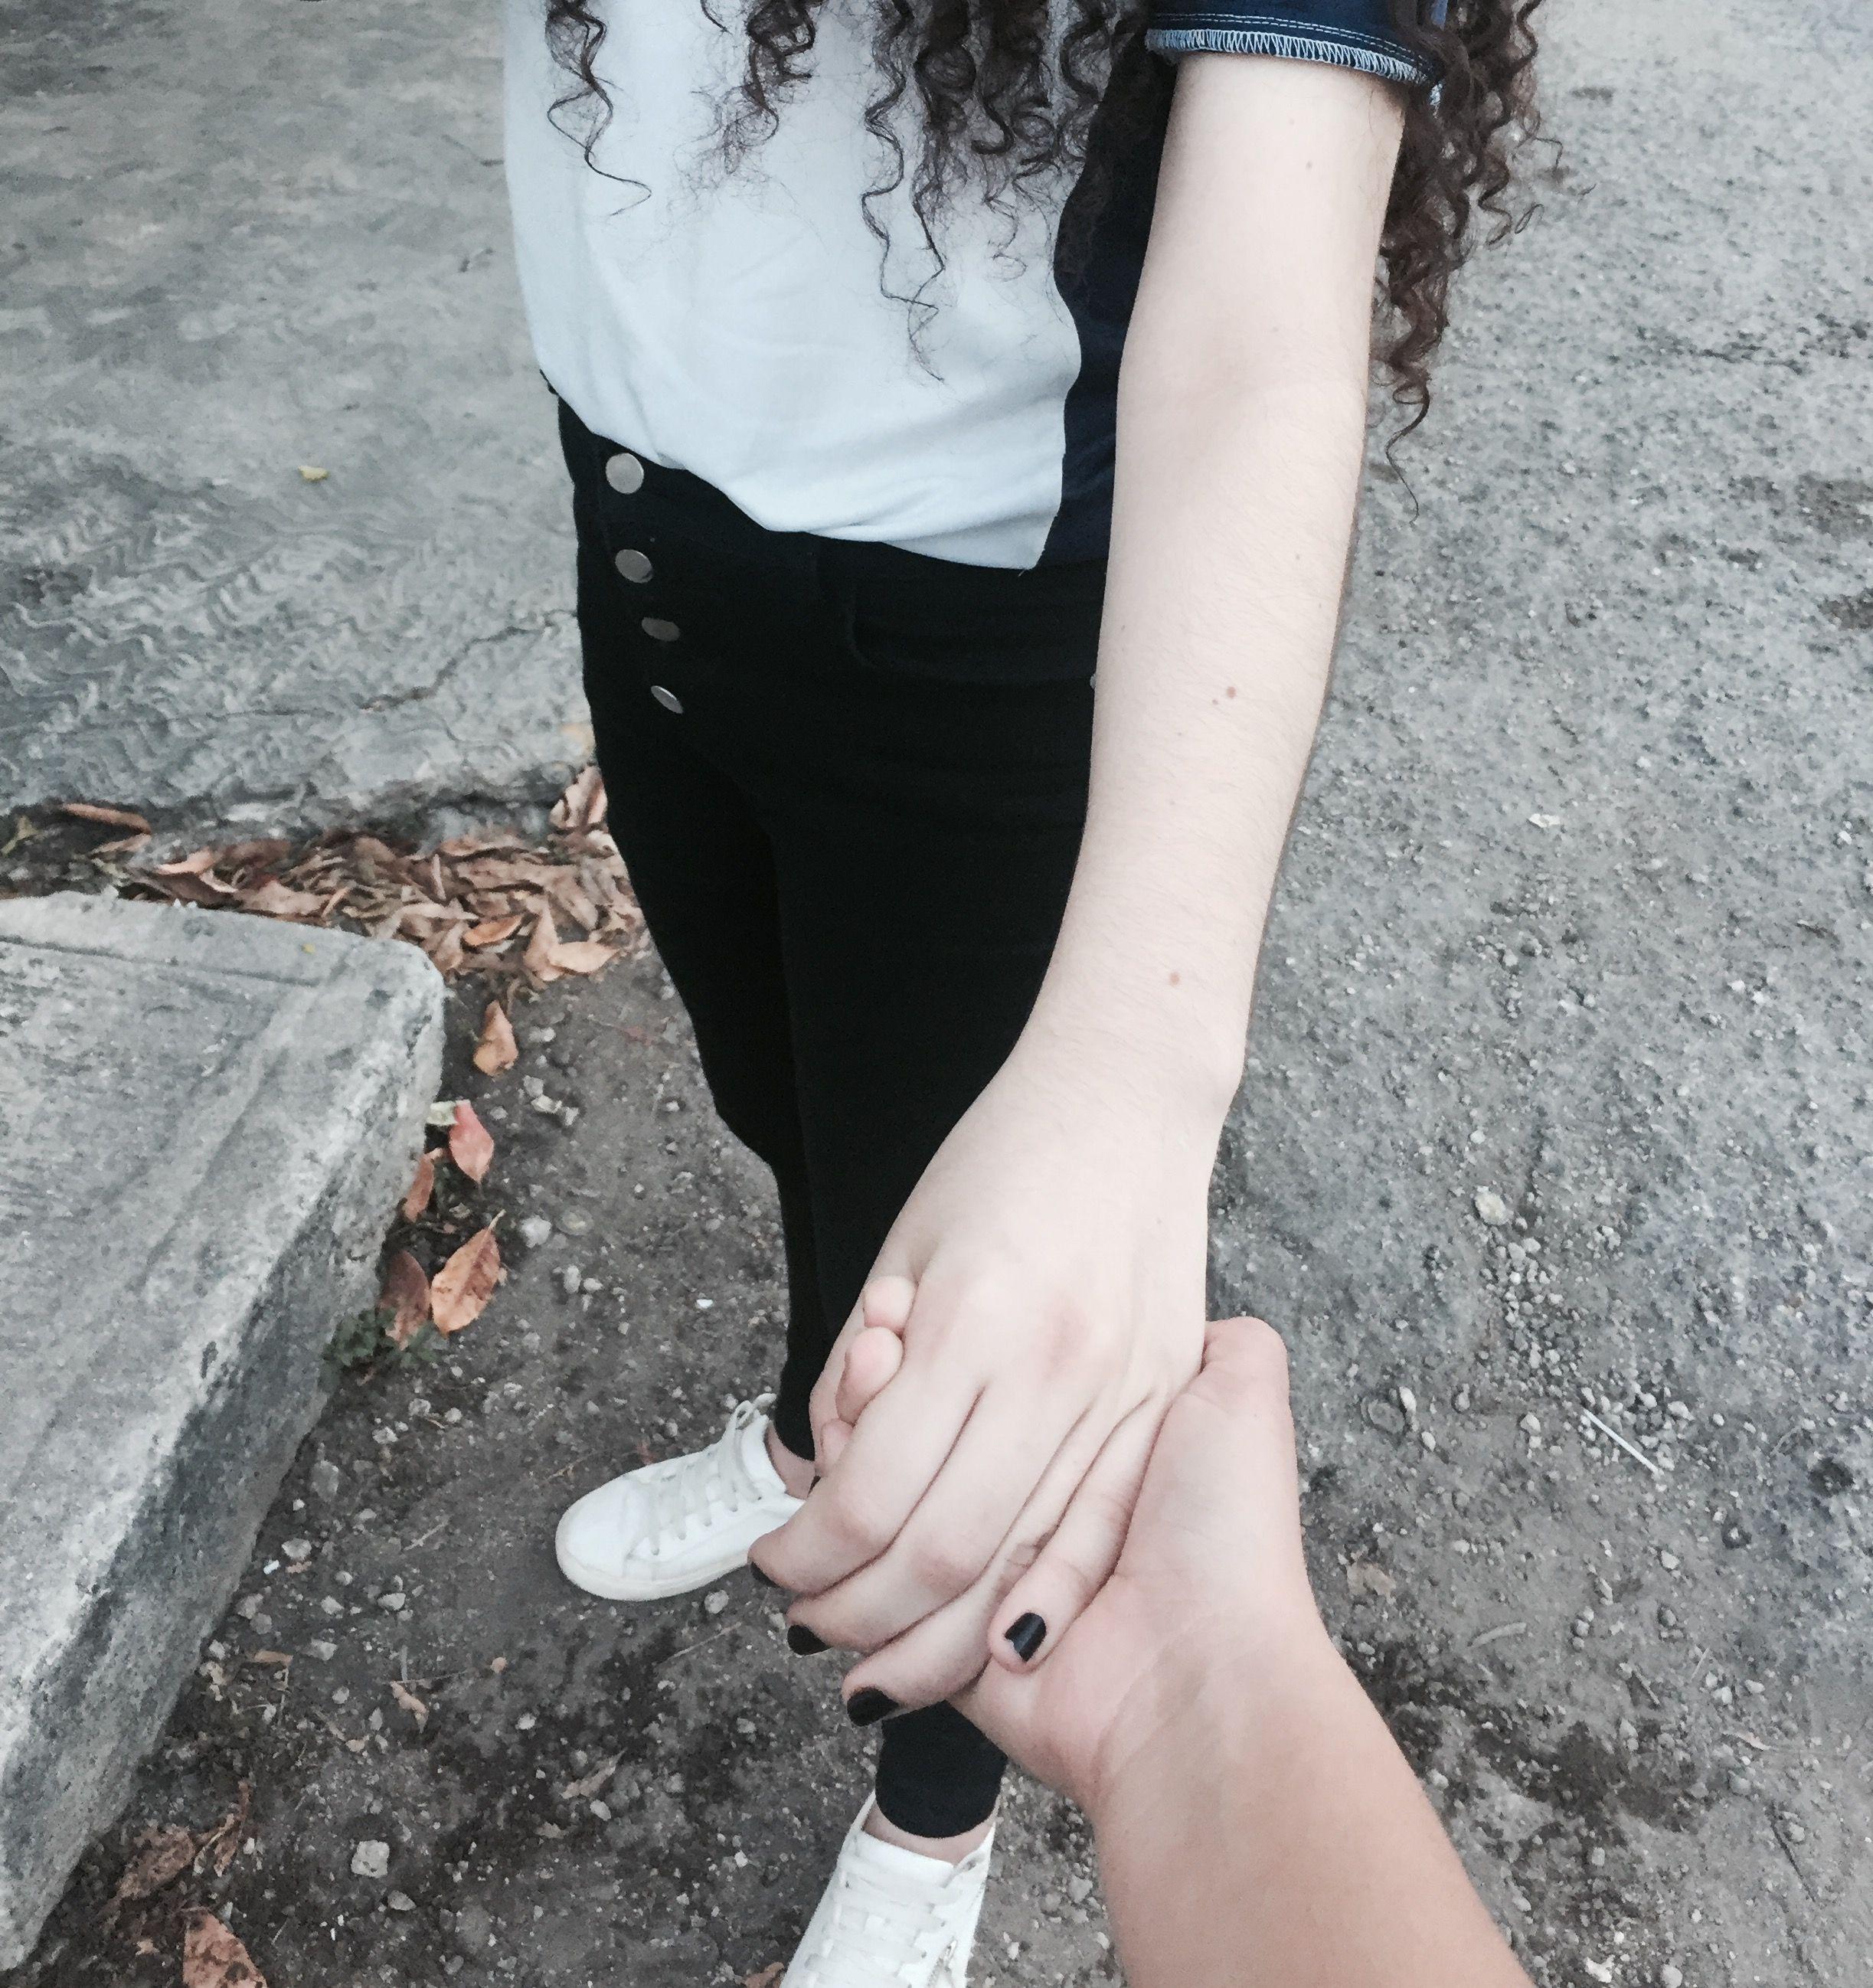 tumblr fotos agarrados de la mano pareja pinterest tumblr